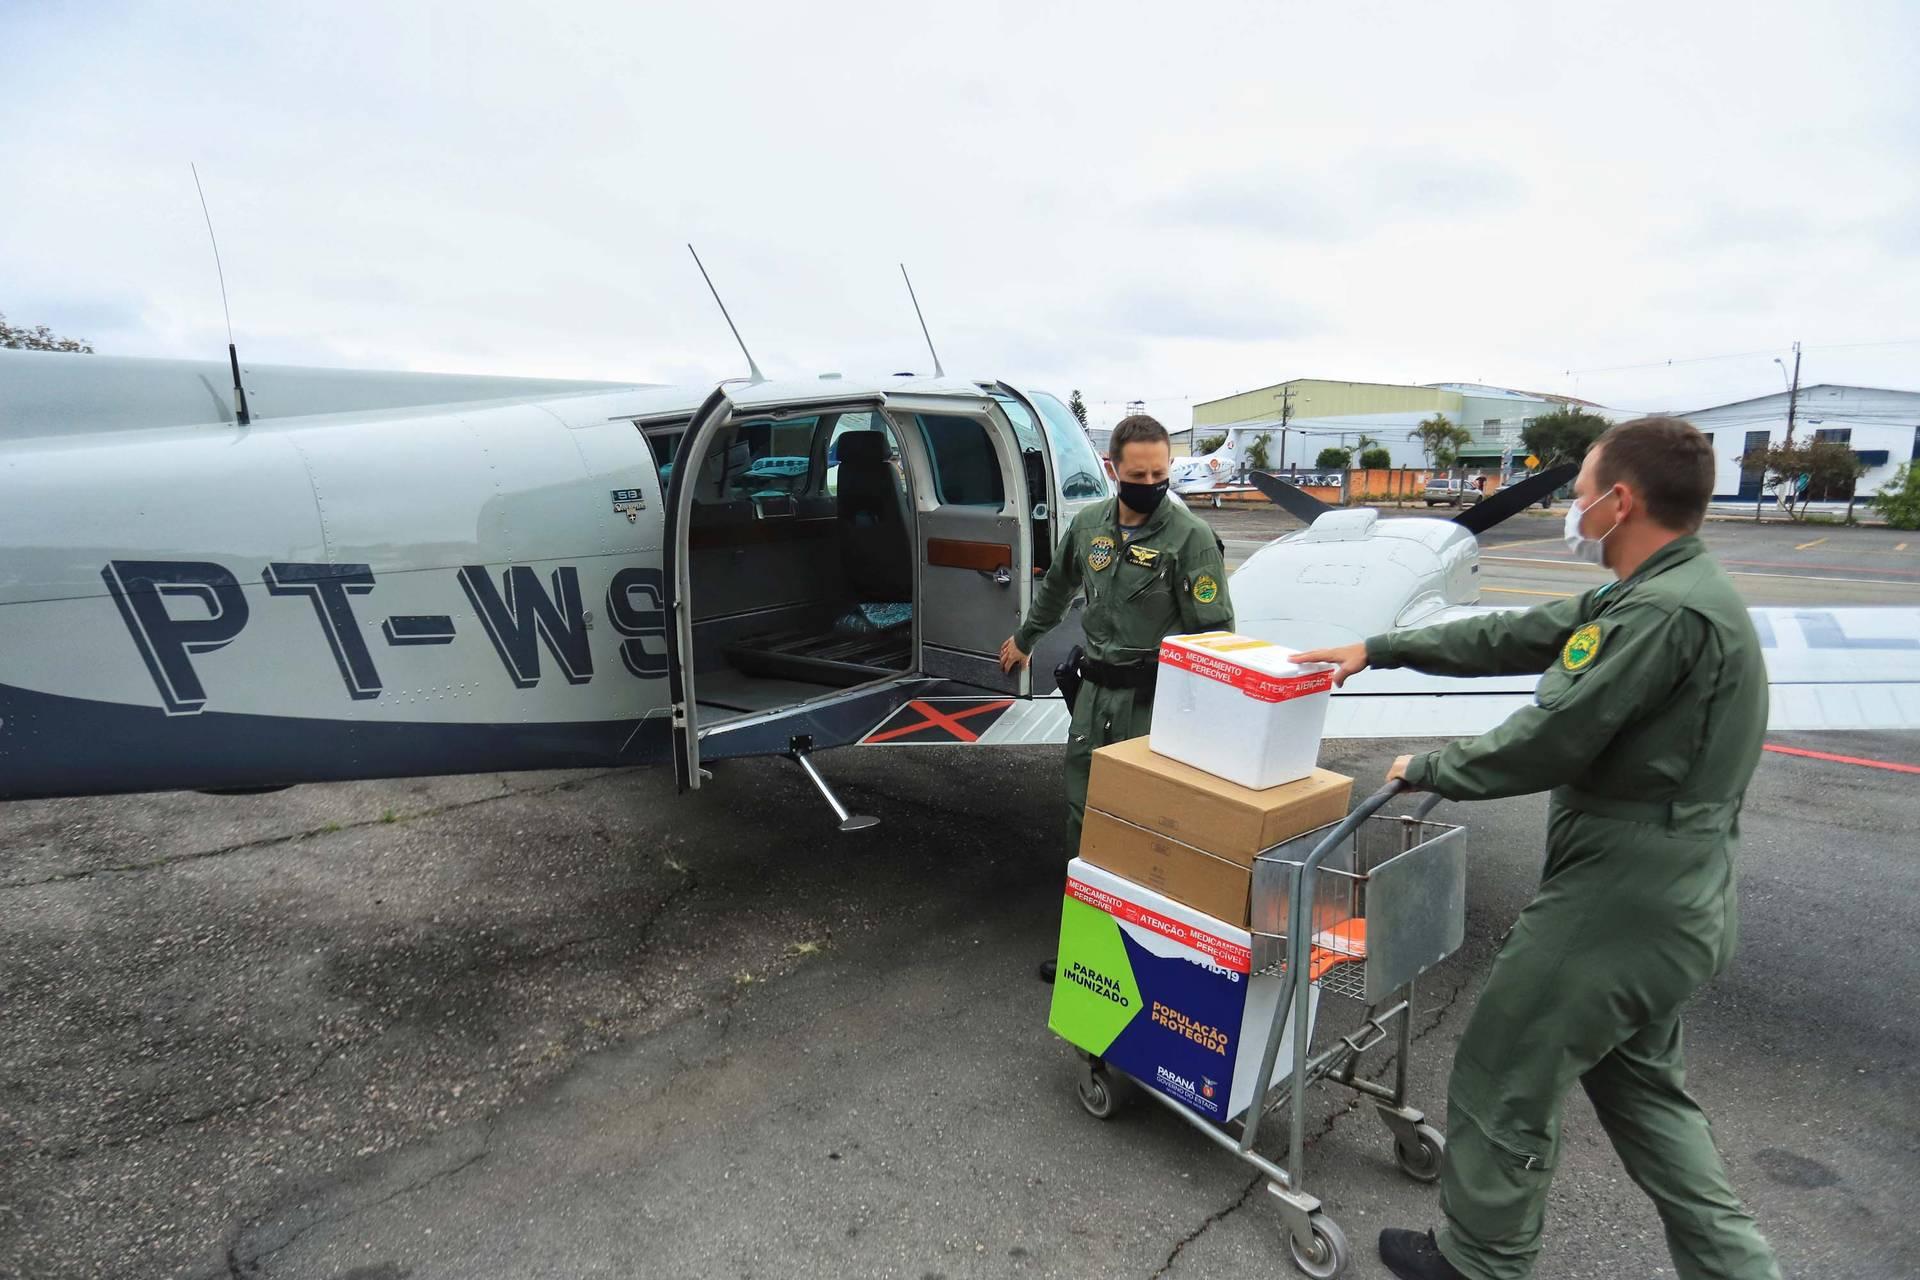 Paraná distribui 37.440 doses de vacina contra Covid-19 da Pfizer para 21 municípios